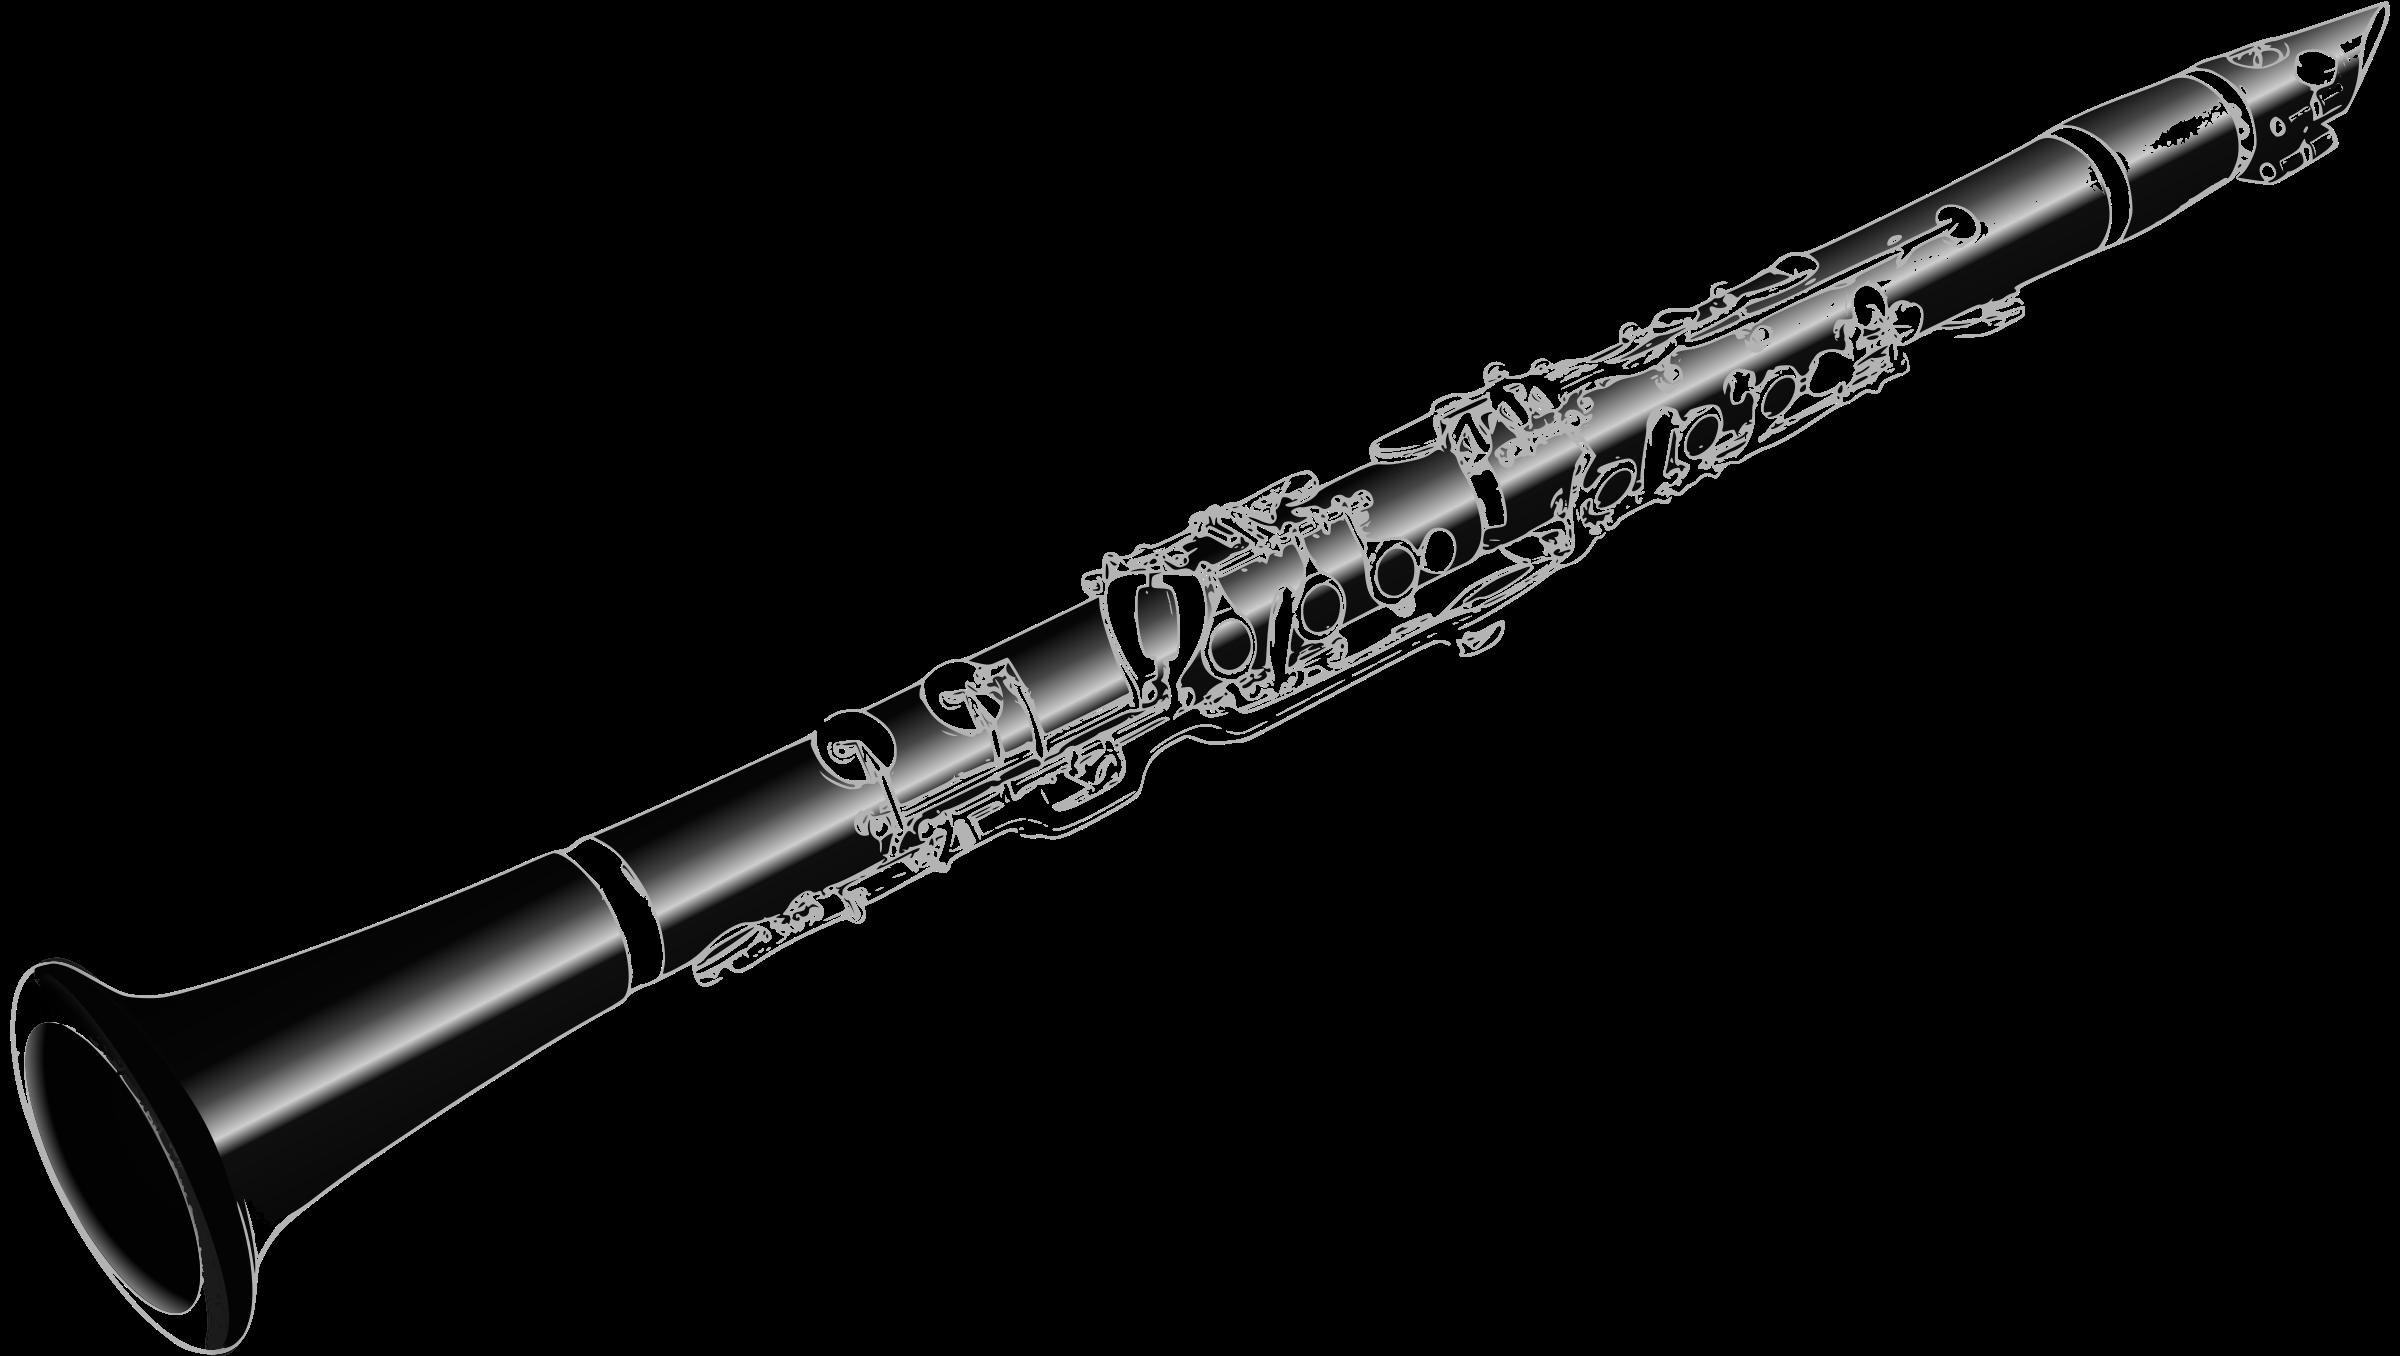 Flutes clipart clarinet, Flutes clarinet Transparent FREE.